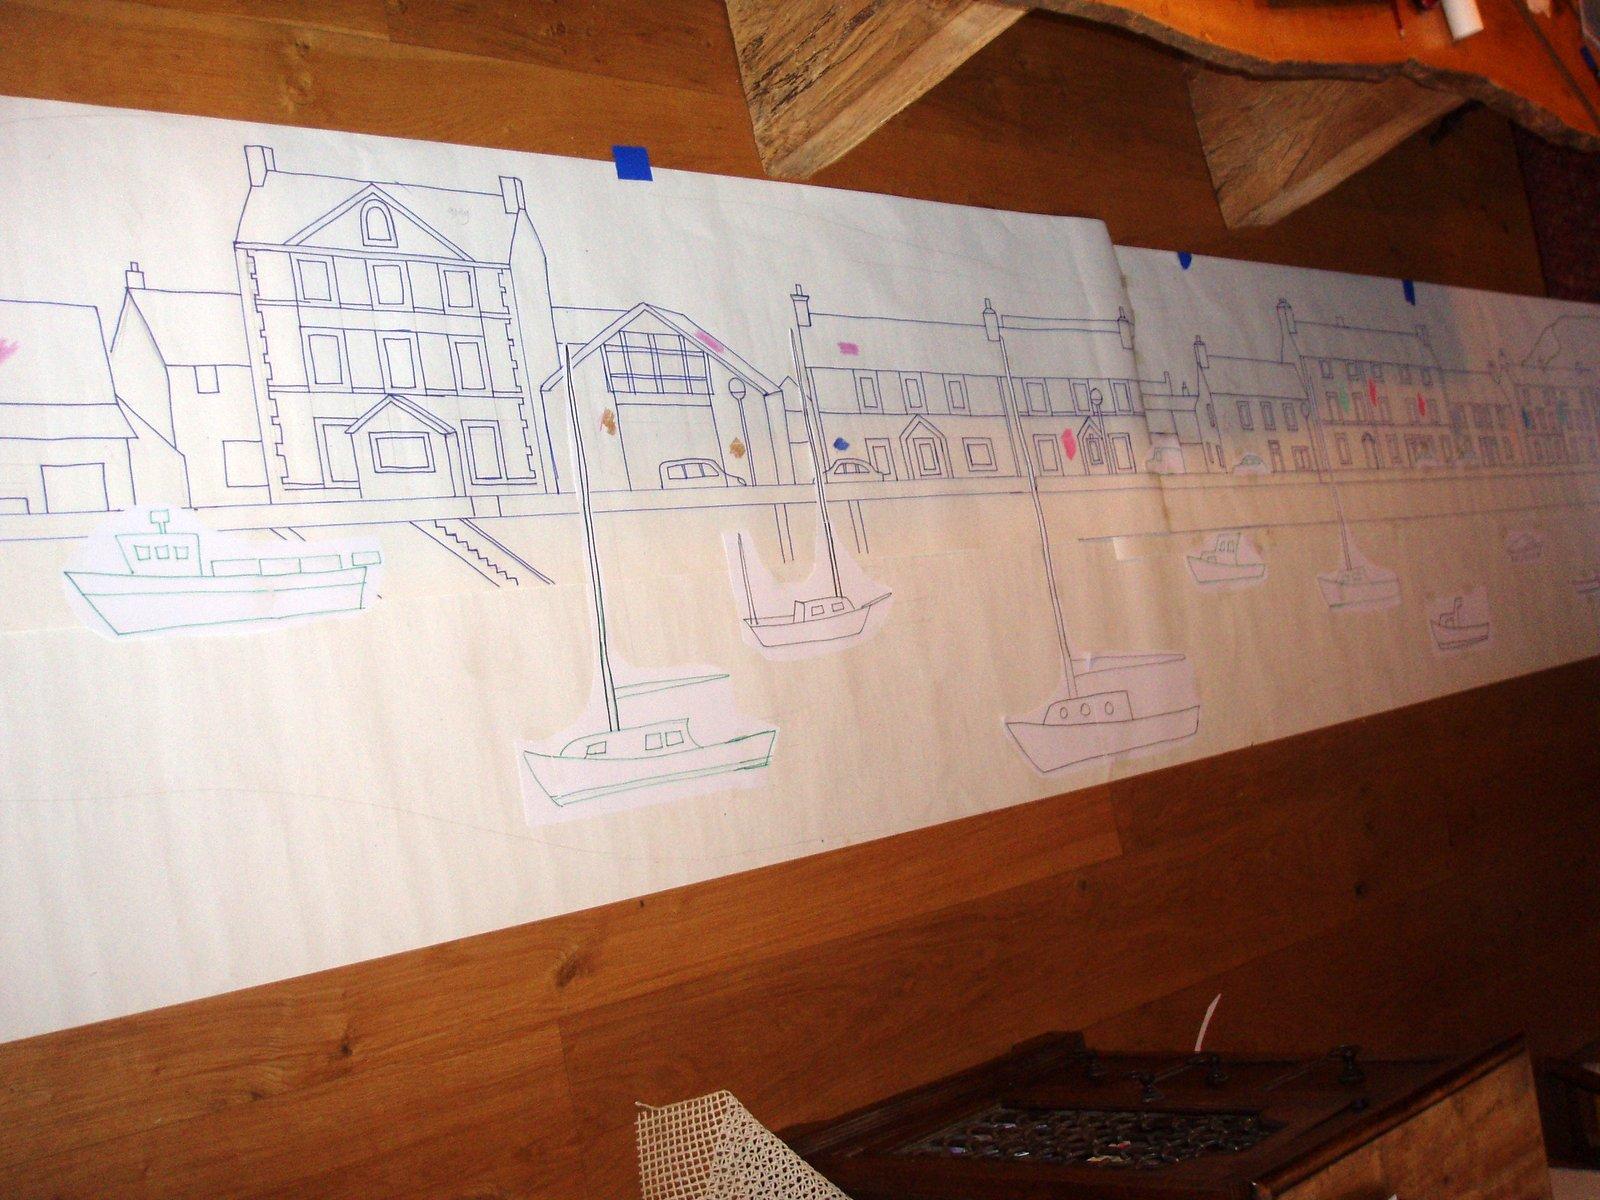 Plan of harbour mosaic for riverside shelter